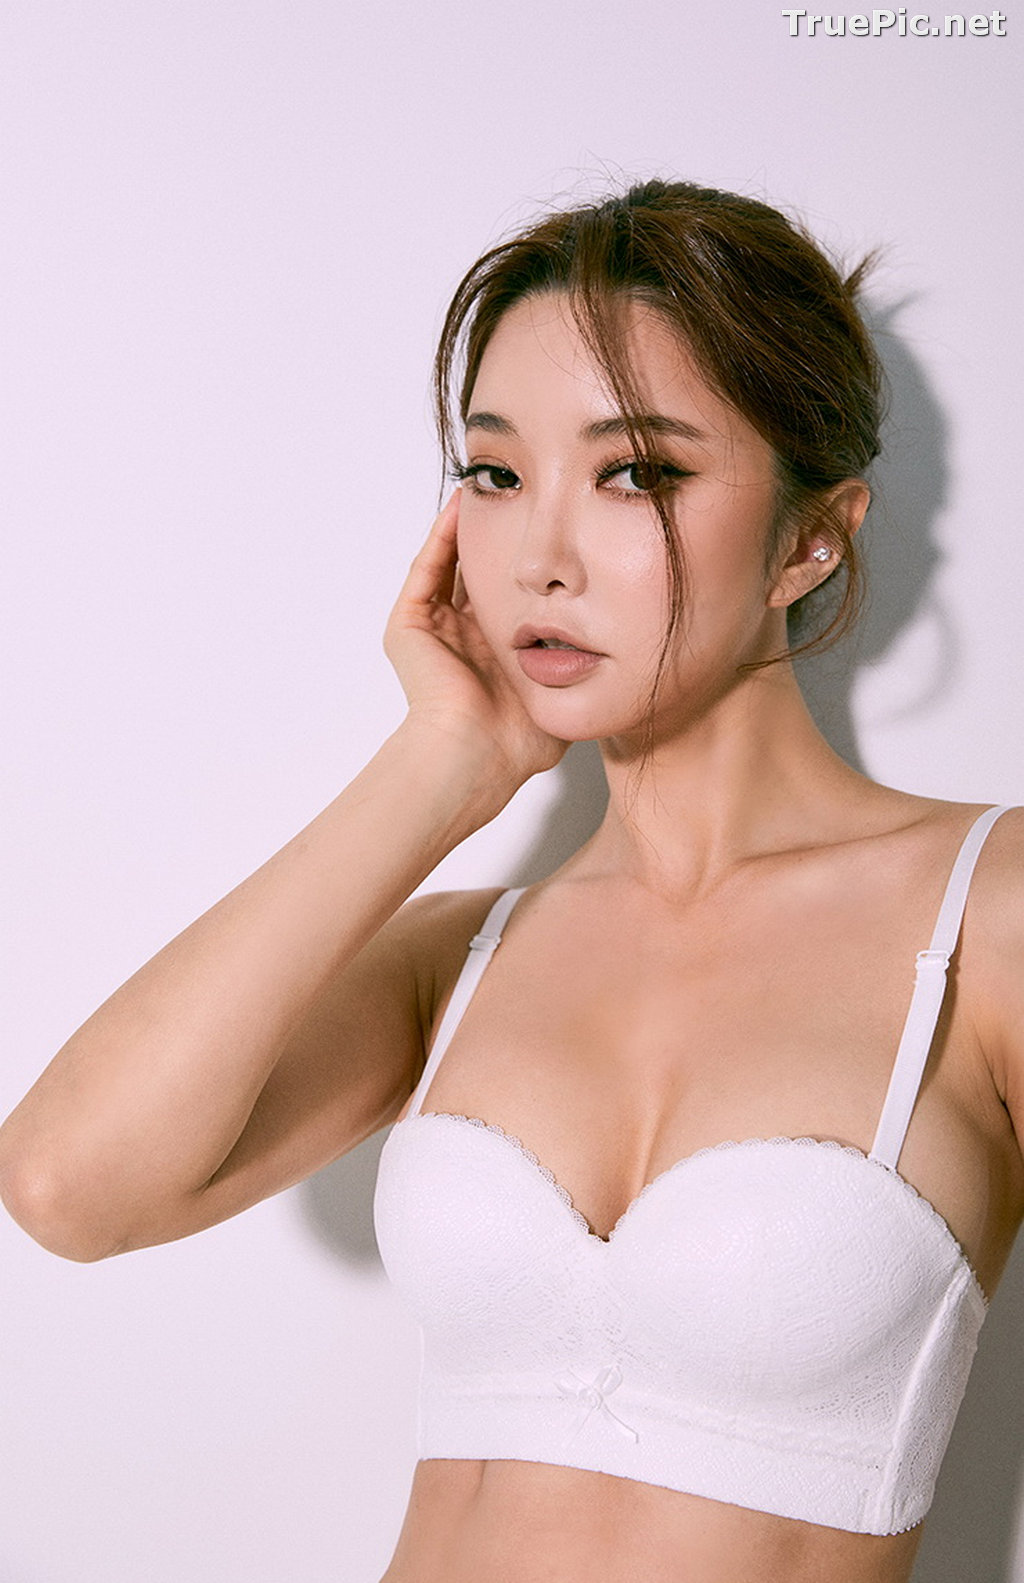 Image Korean Fashion Model - Park Soo Yeon - Open Up Lingerie - TruePic.net - Picture-8